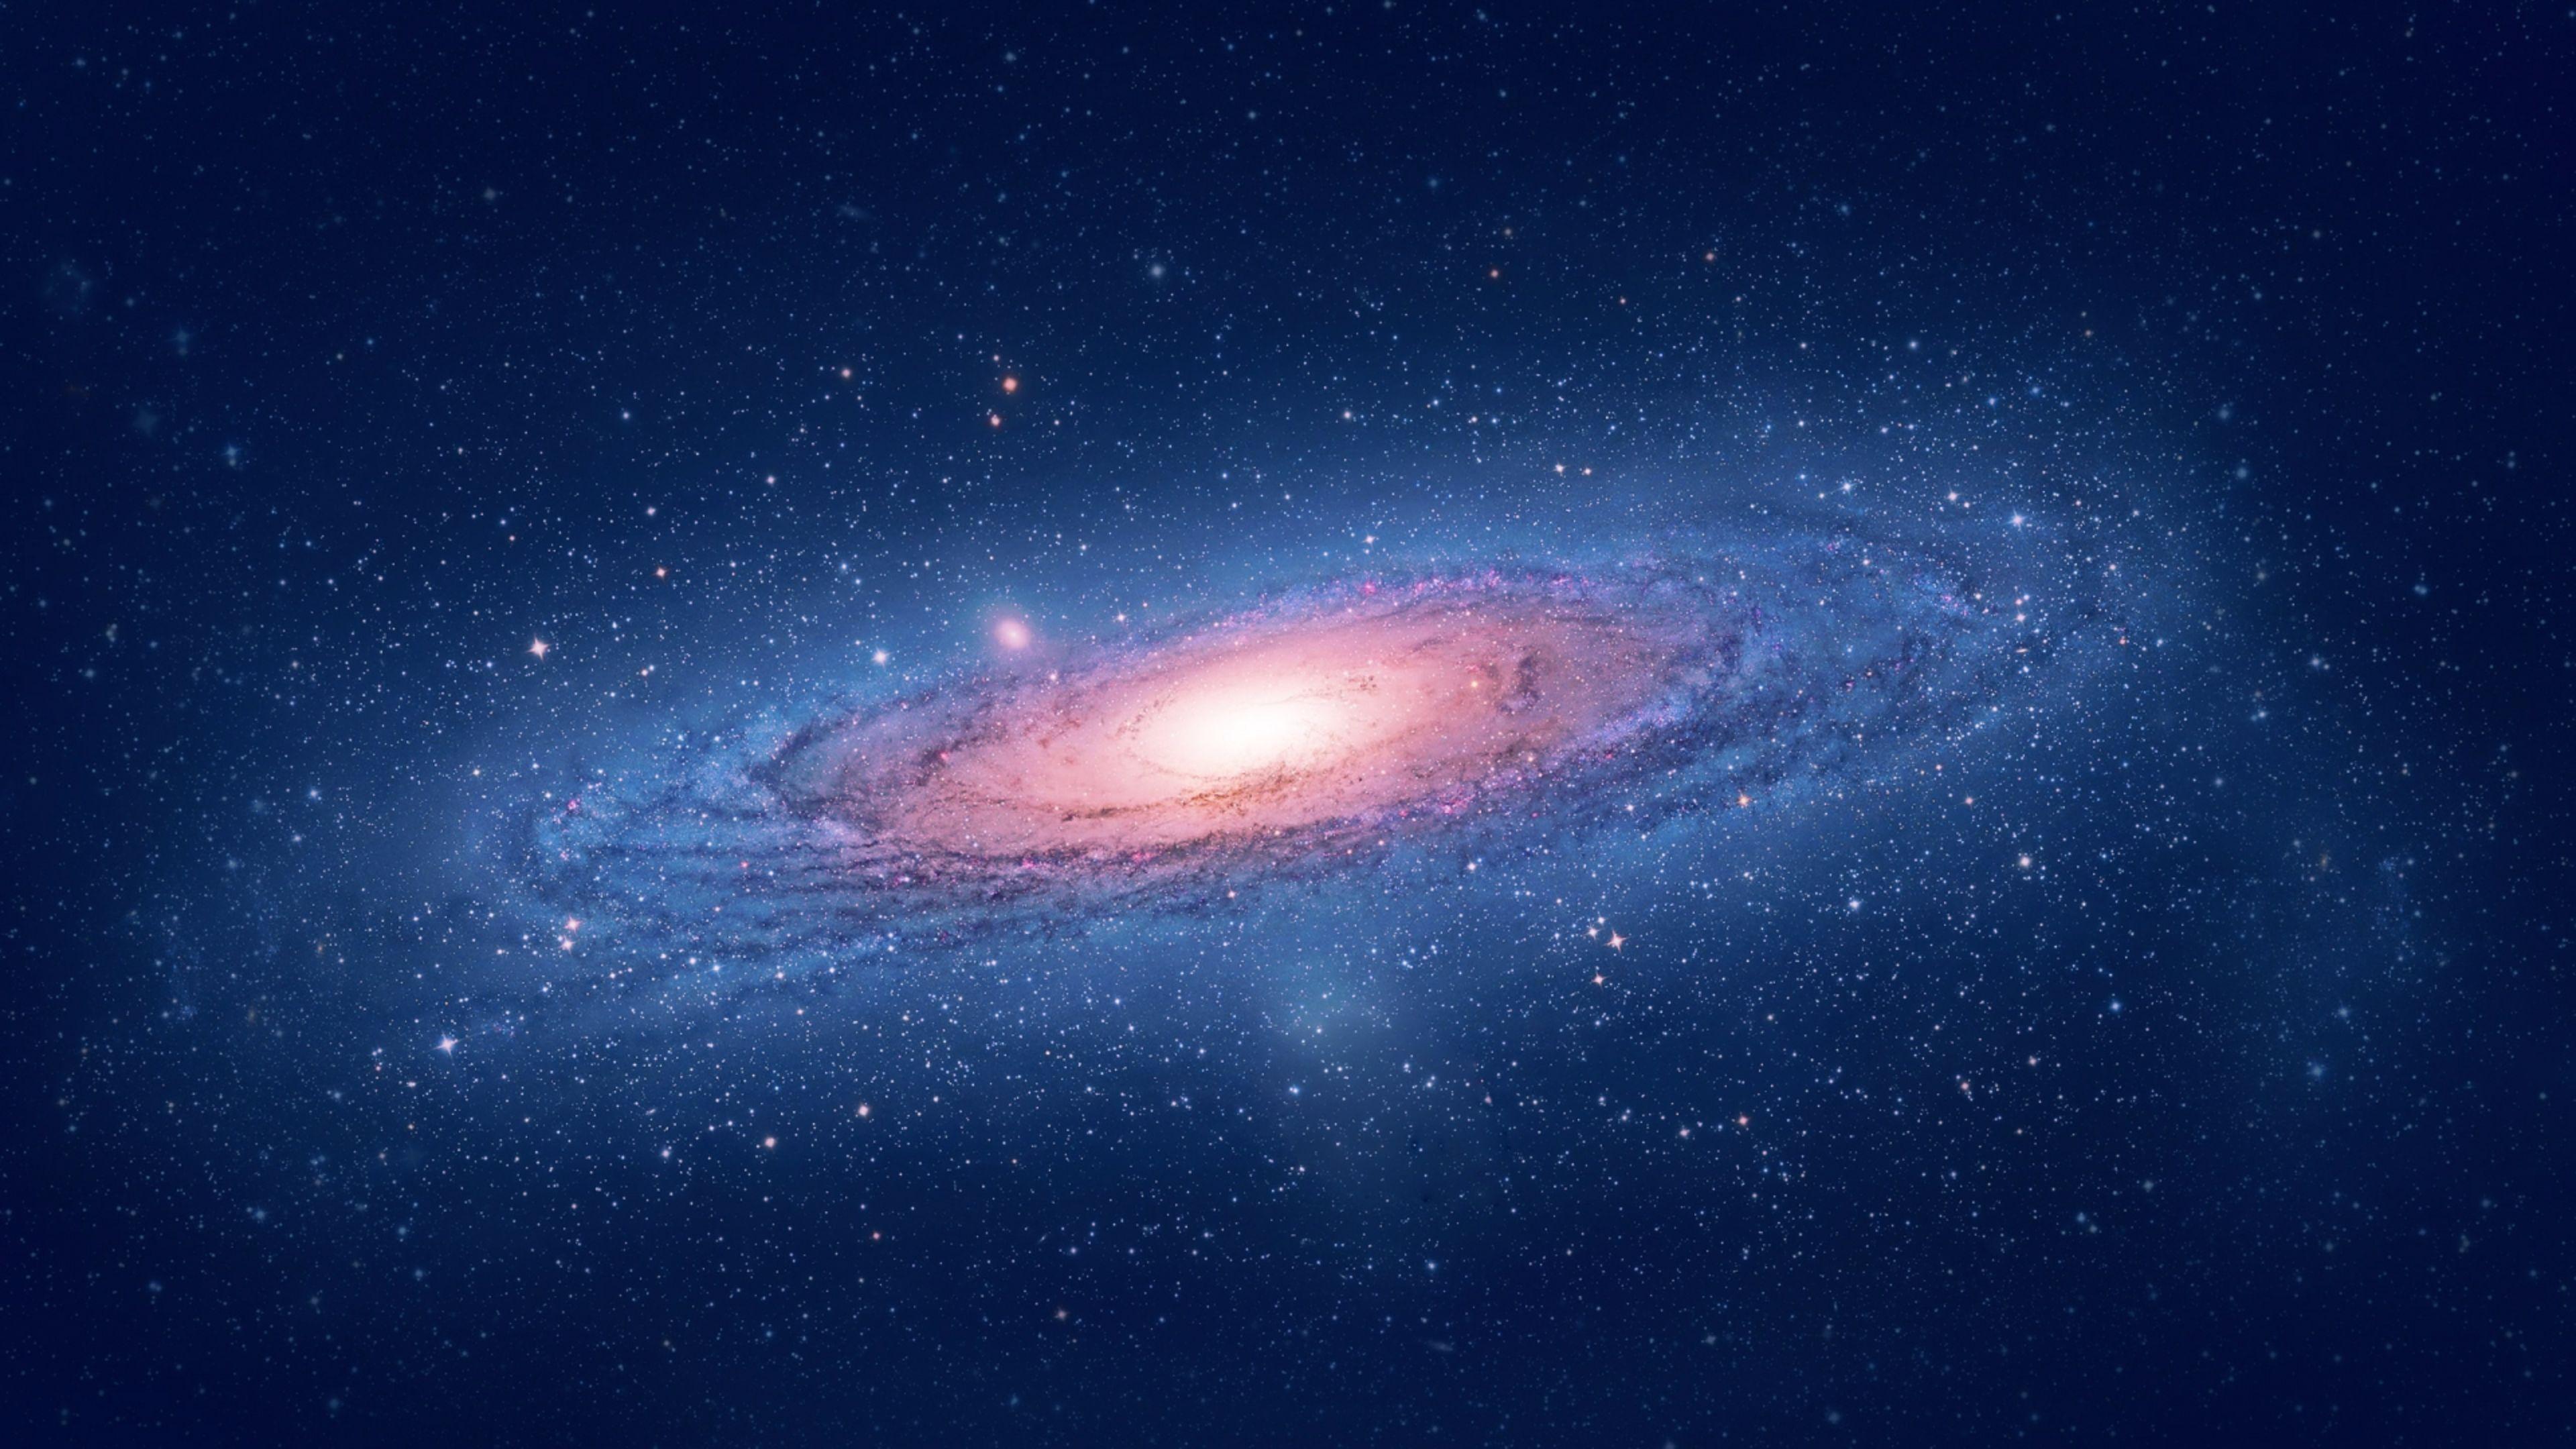 4k Space Wallpaper: Top Free 4K Nebula Backgrounds